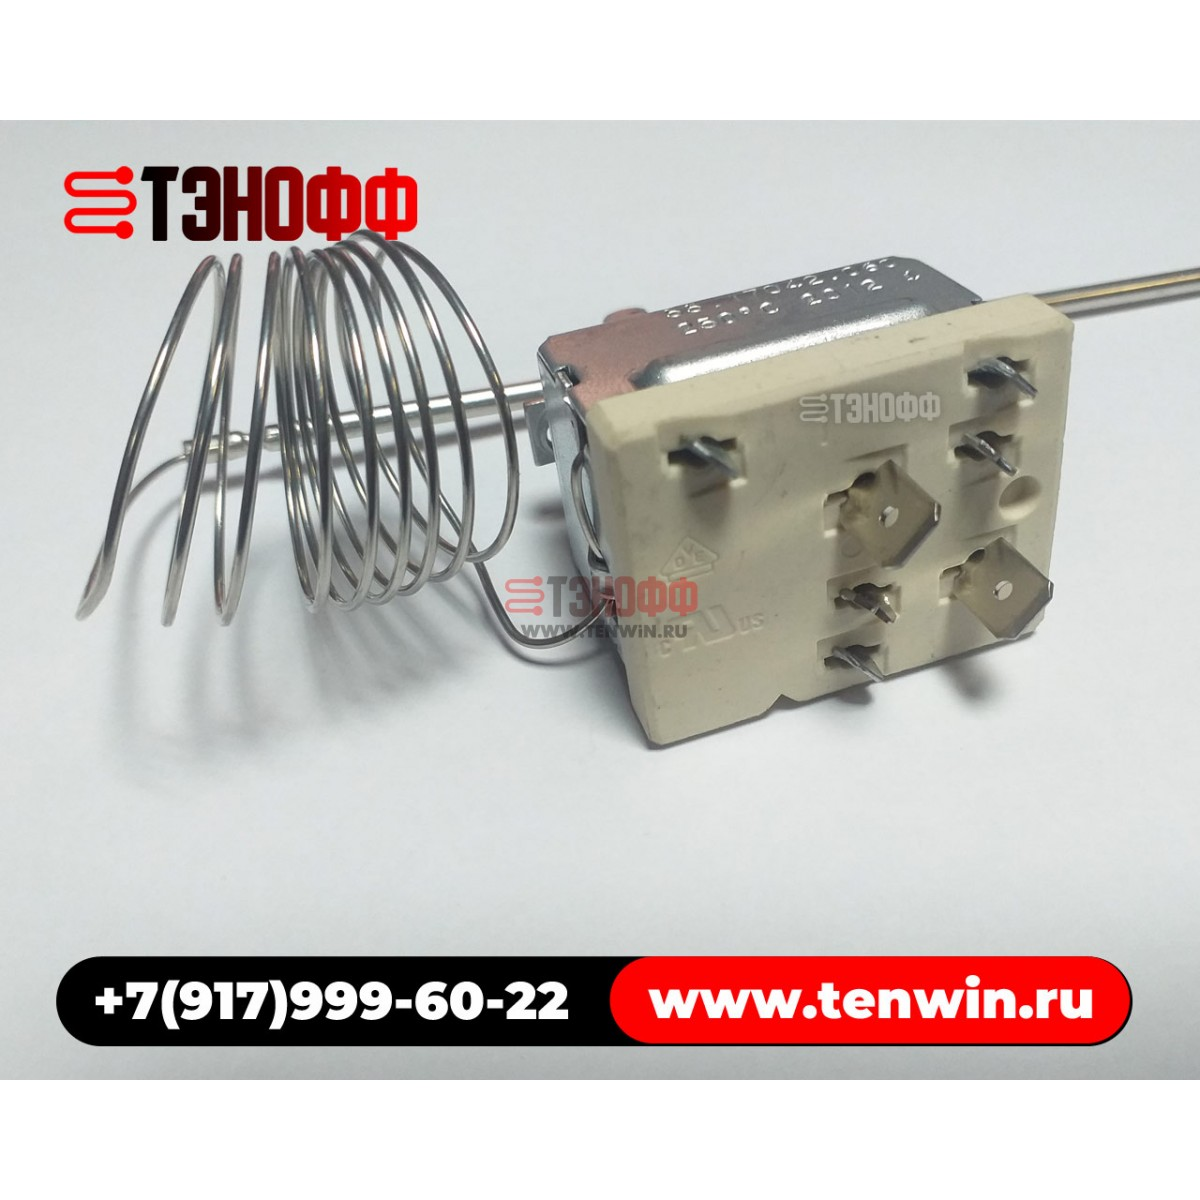 Терморегулятор 250гр. / EGO 55.17042.060 духового шкафа